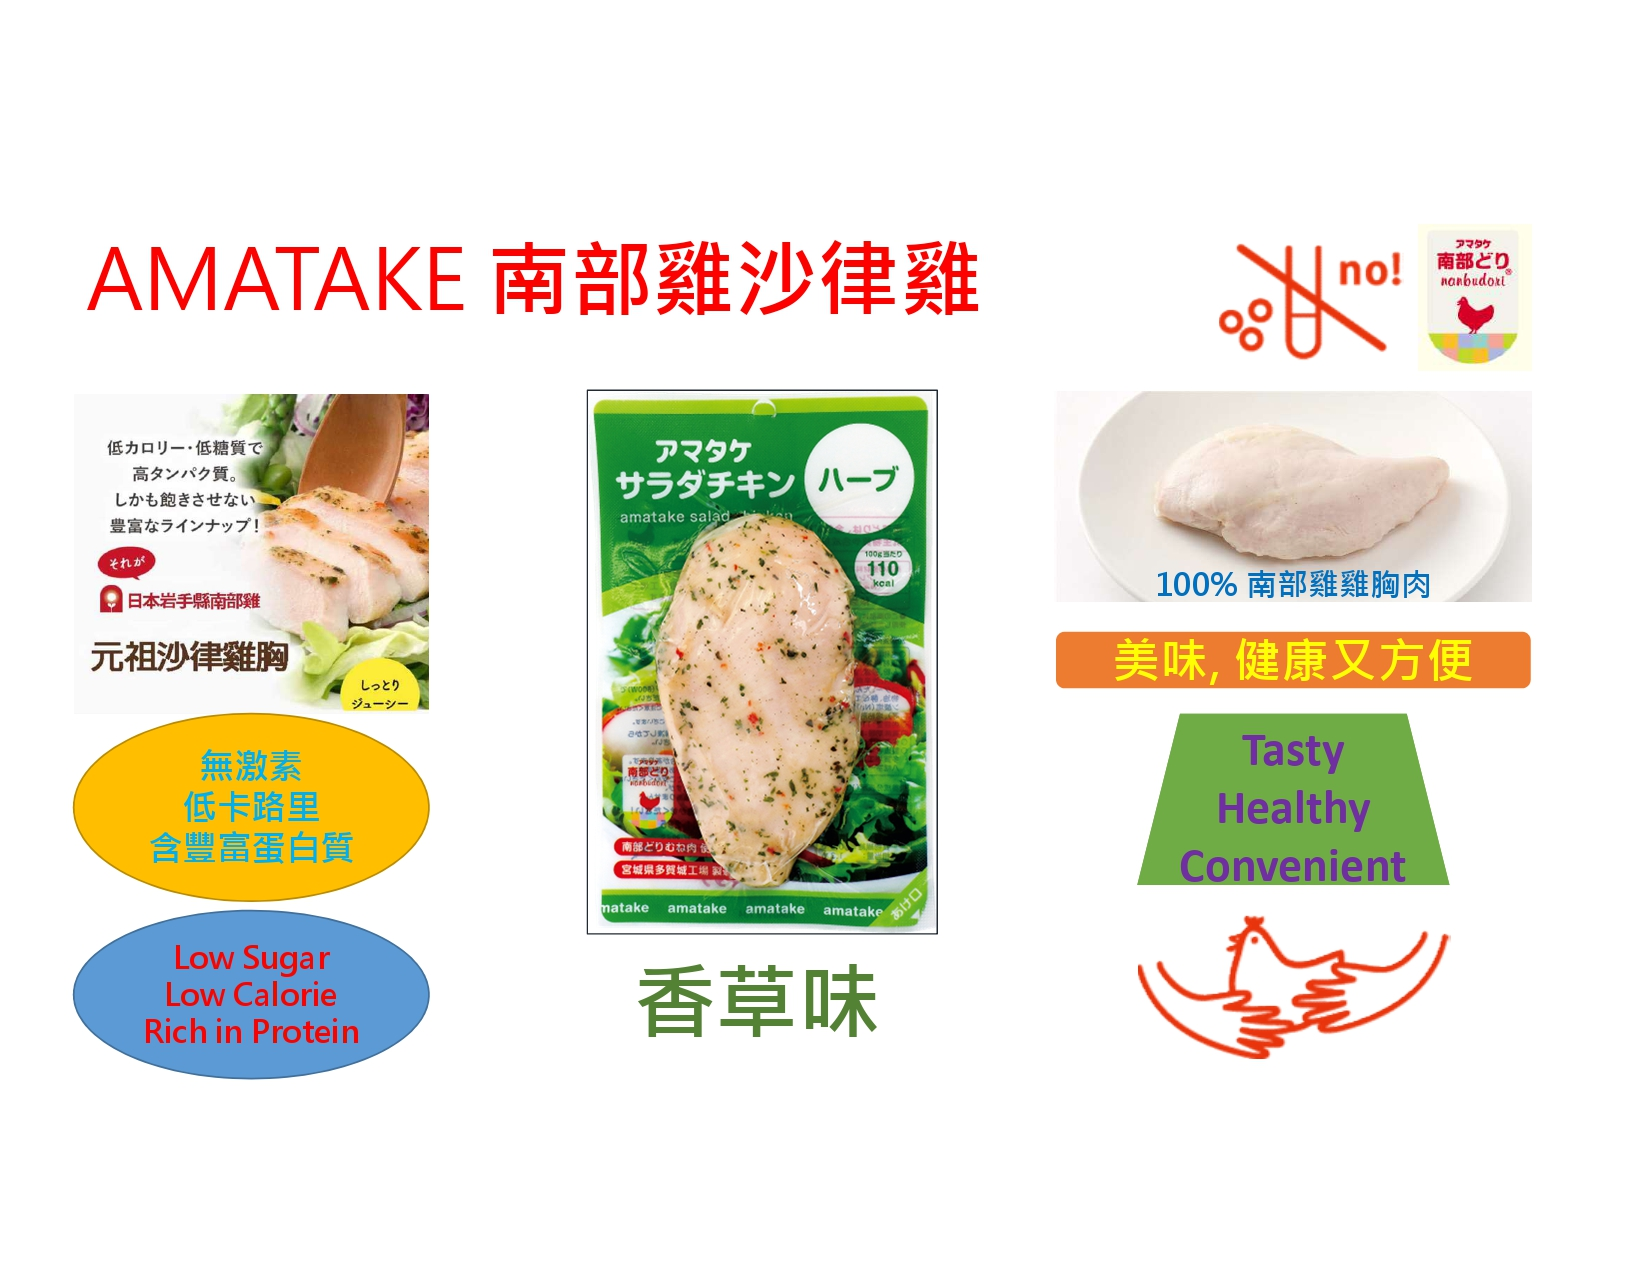 南部雞沙律雞 店鋪 CATALOG (29-08-20)_page-0002